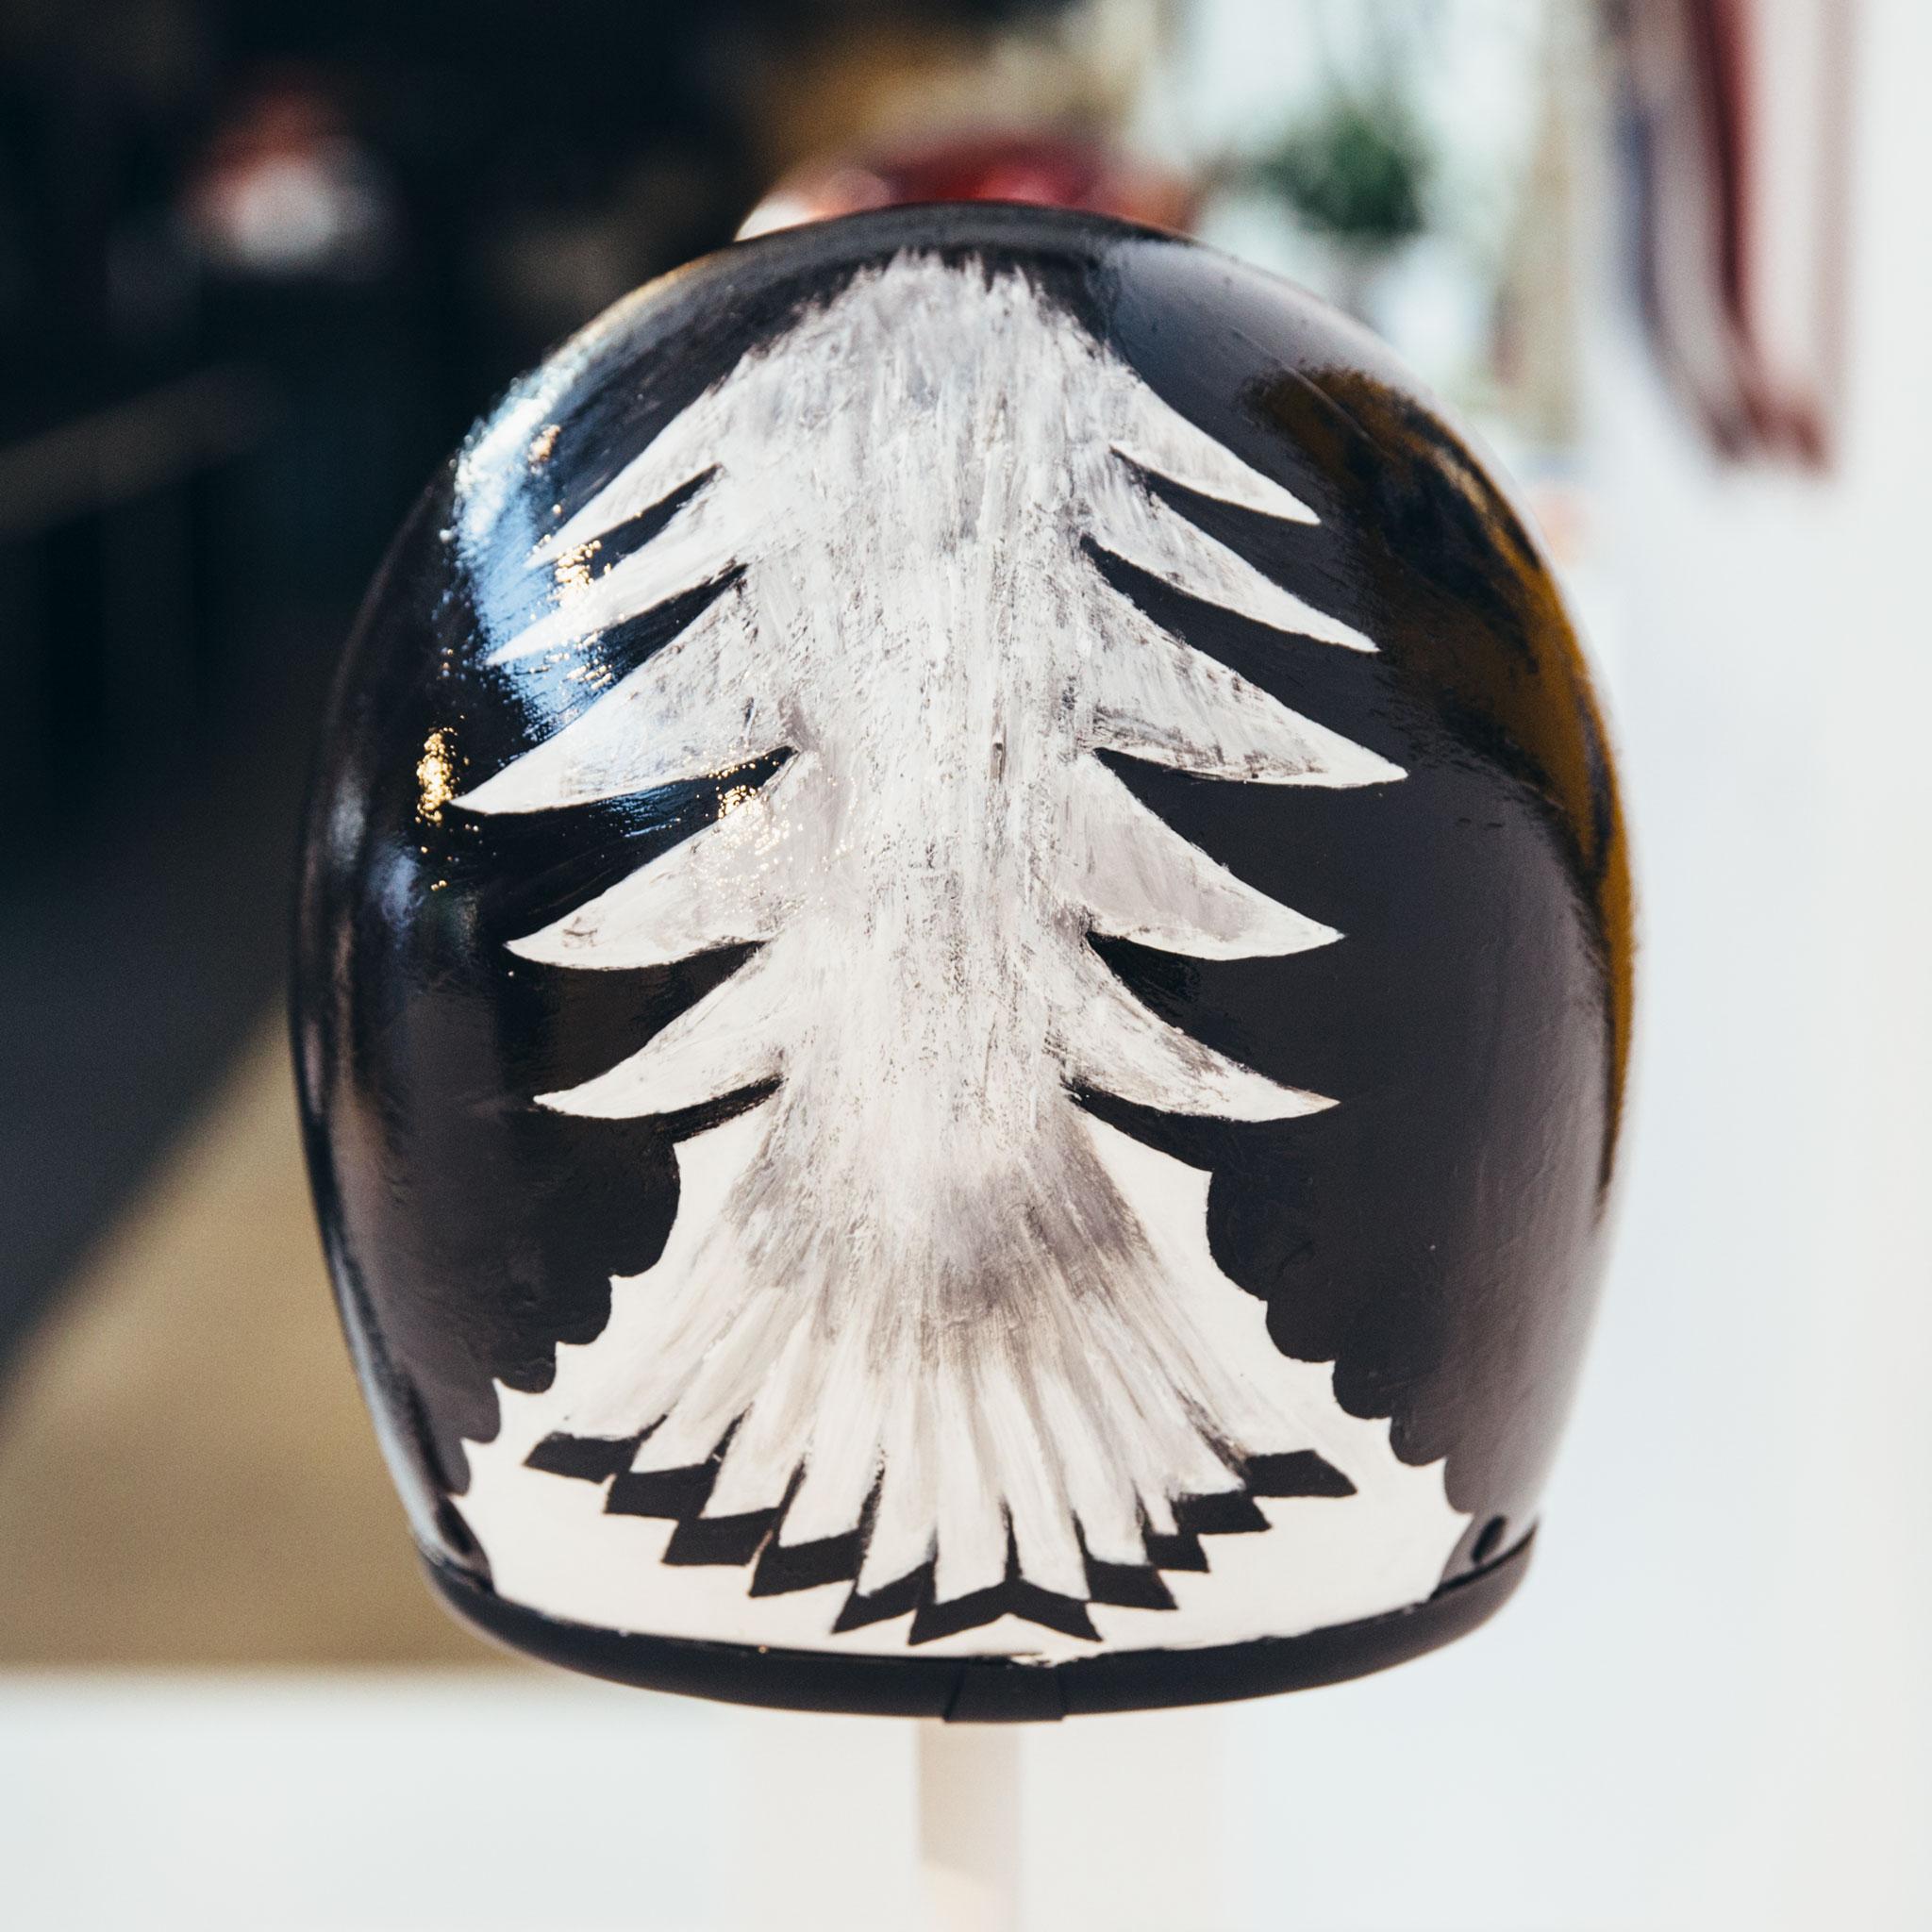 Art Pharamacy_Vandal Gallery_Sabotage MotorcyclesTwenty20_exhibition_5487.jpg